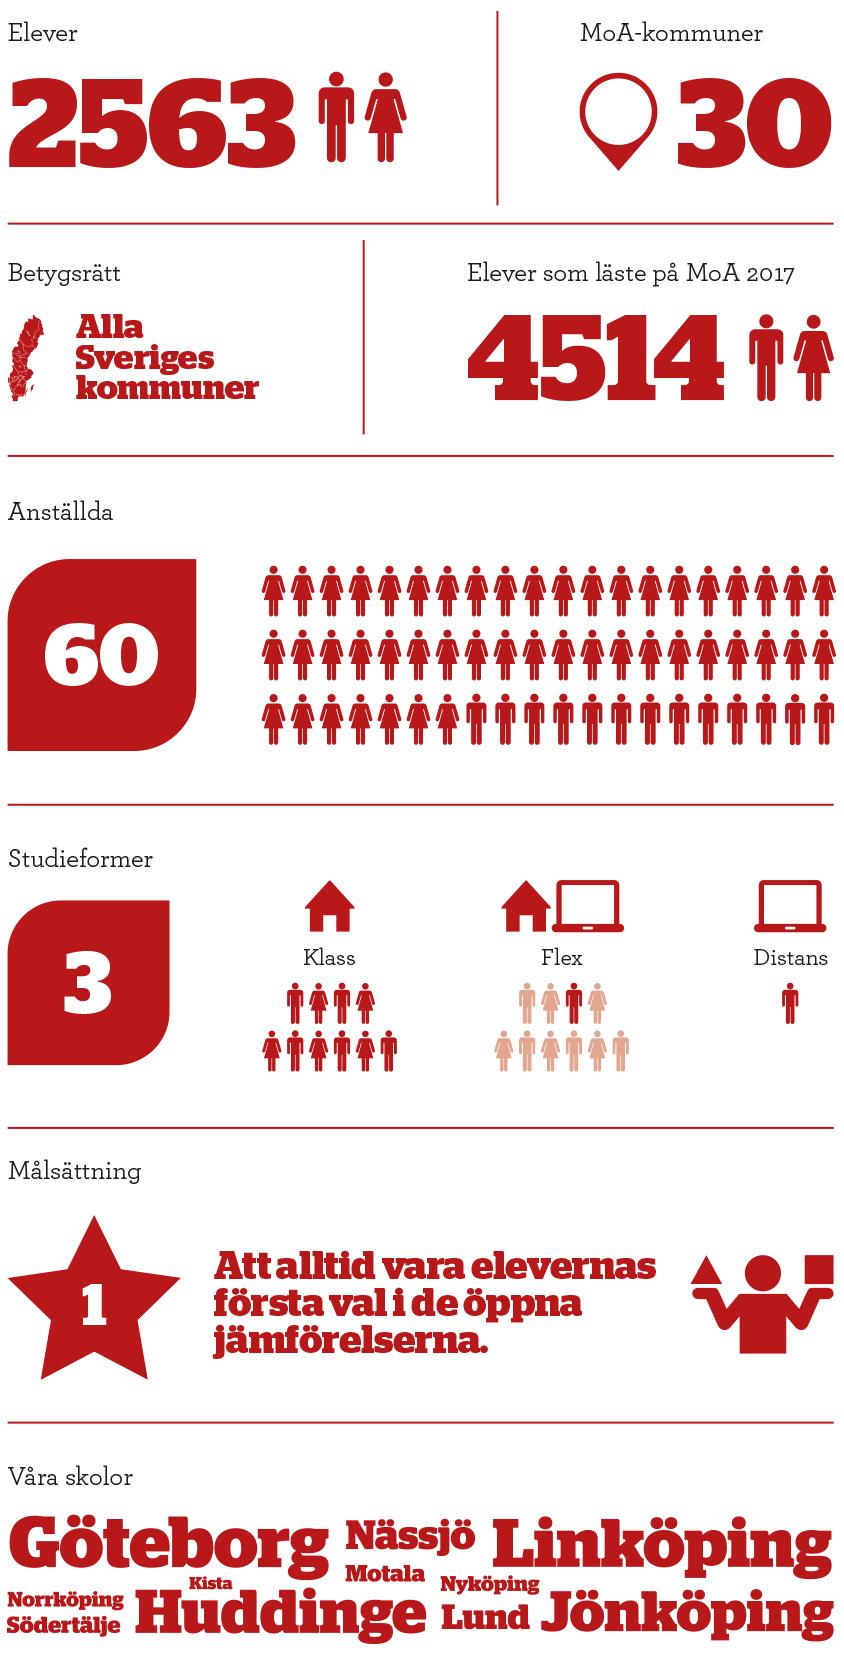 Moa_infographic